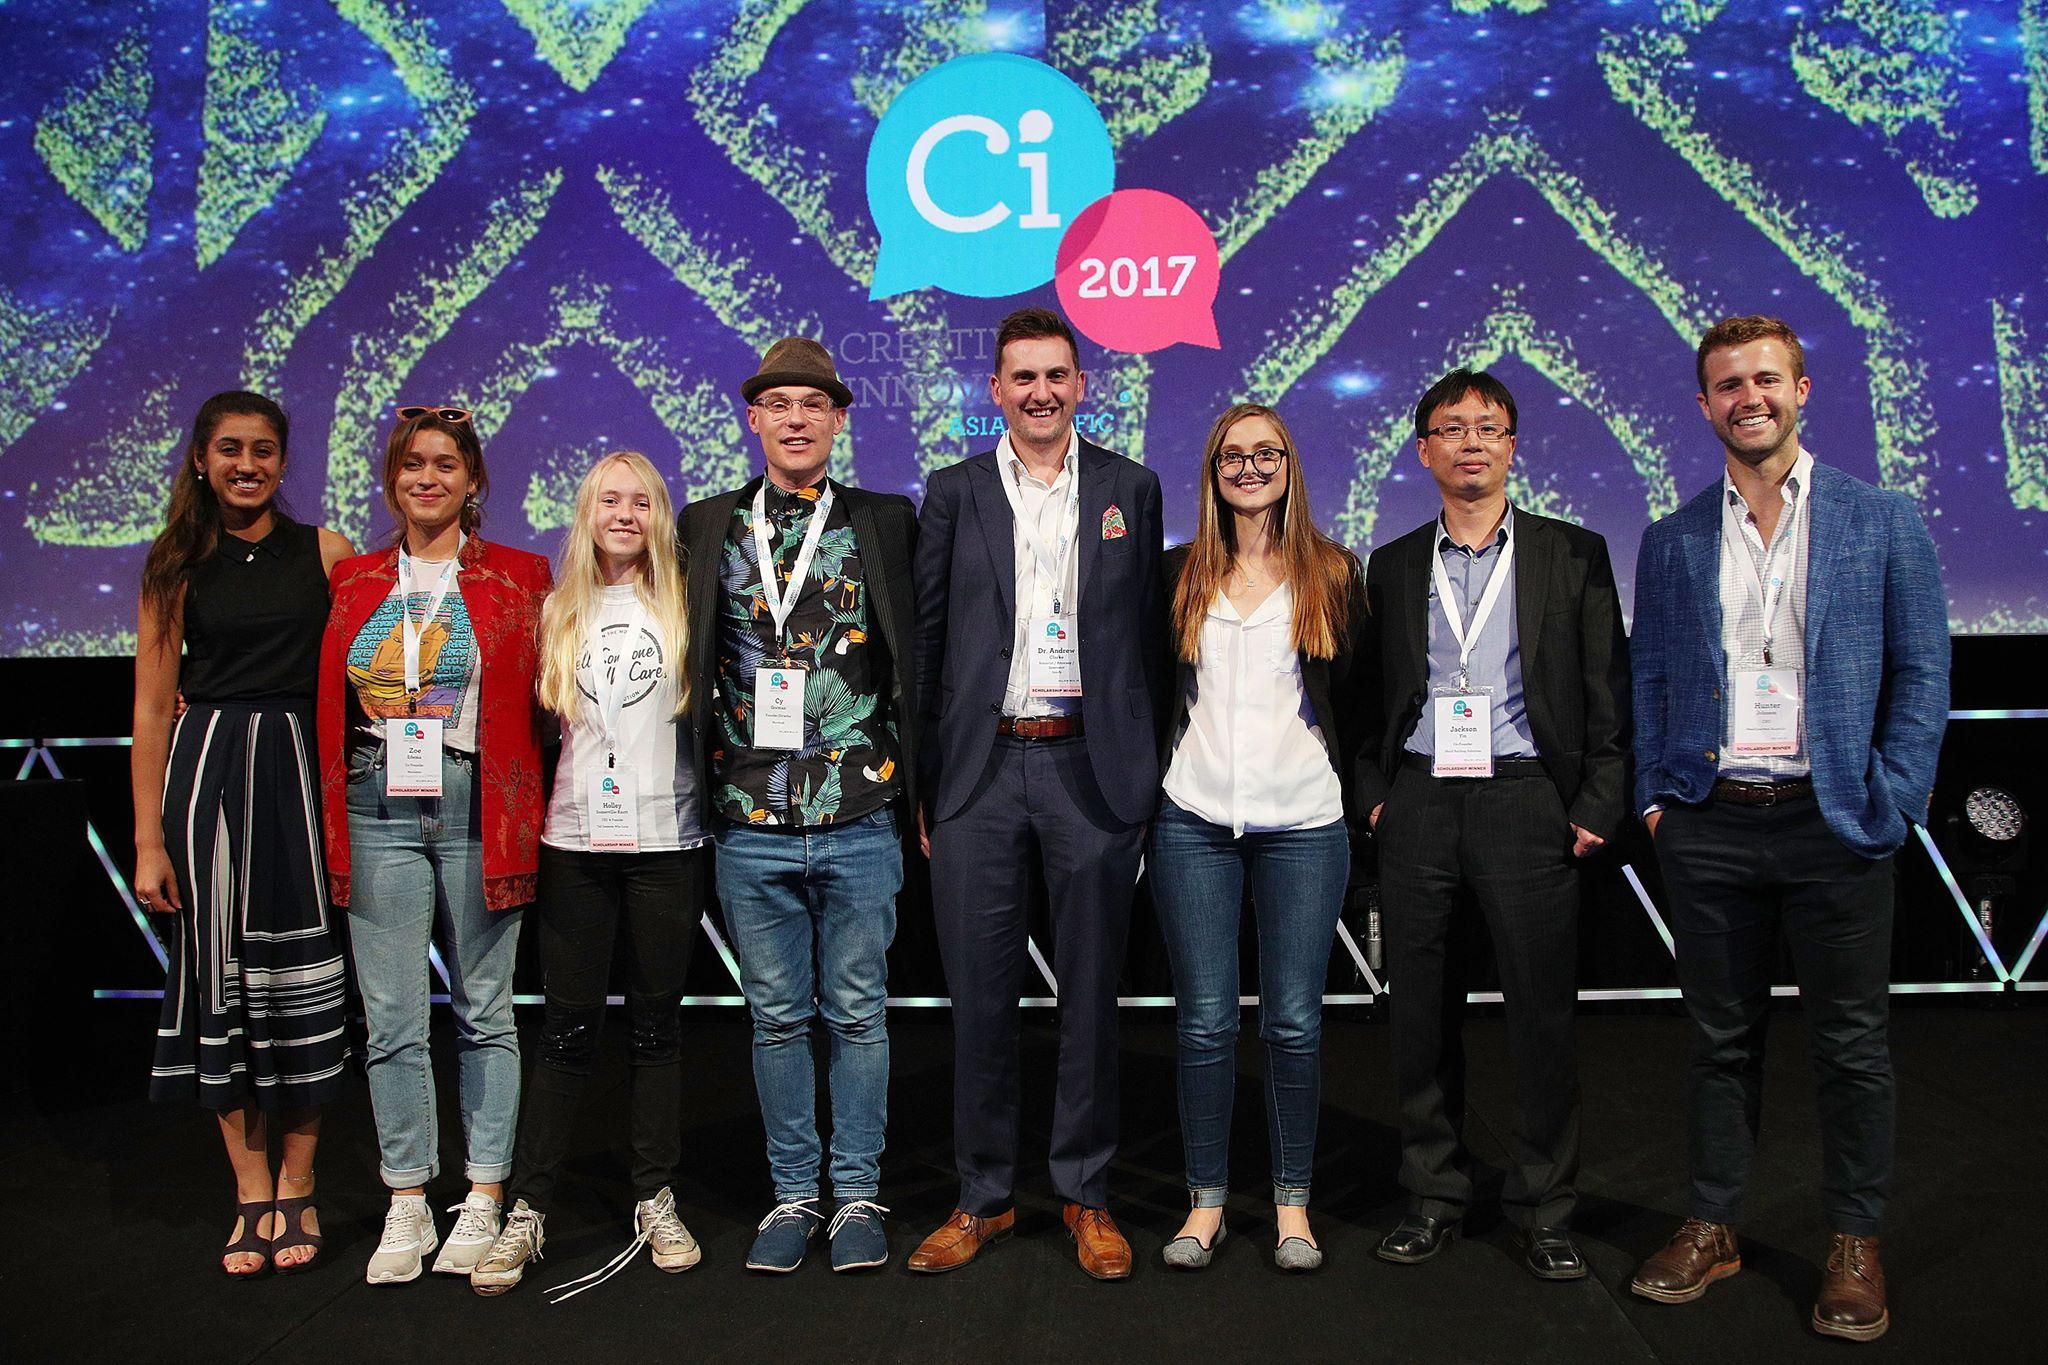 ci2017 Scholarship Winners photos.jpg